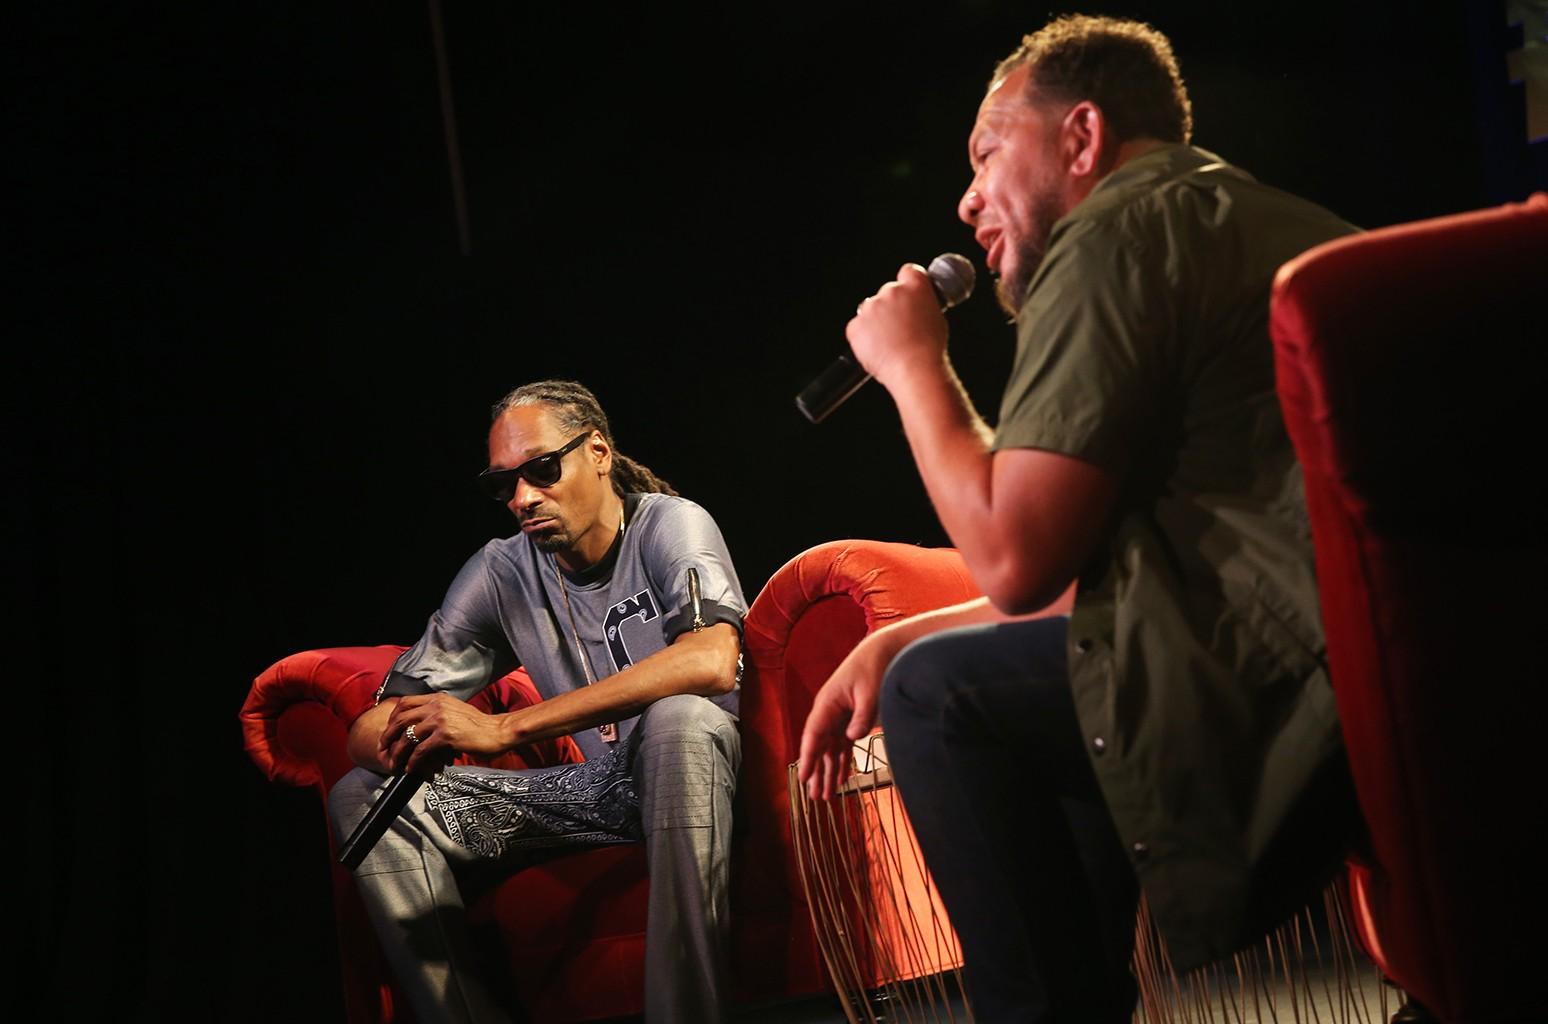 Elliott Wilson interviews Snoop Dogg